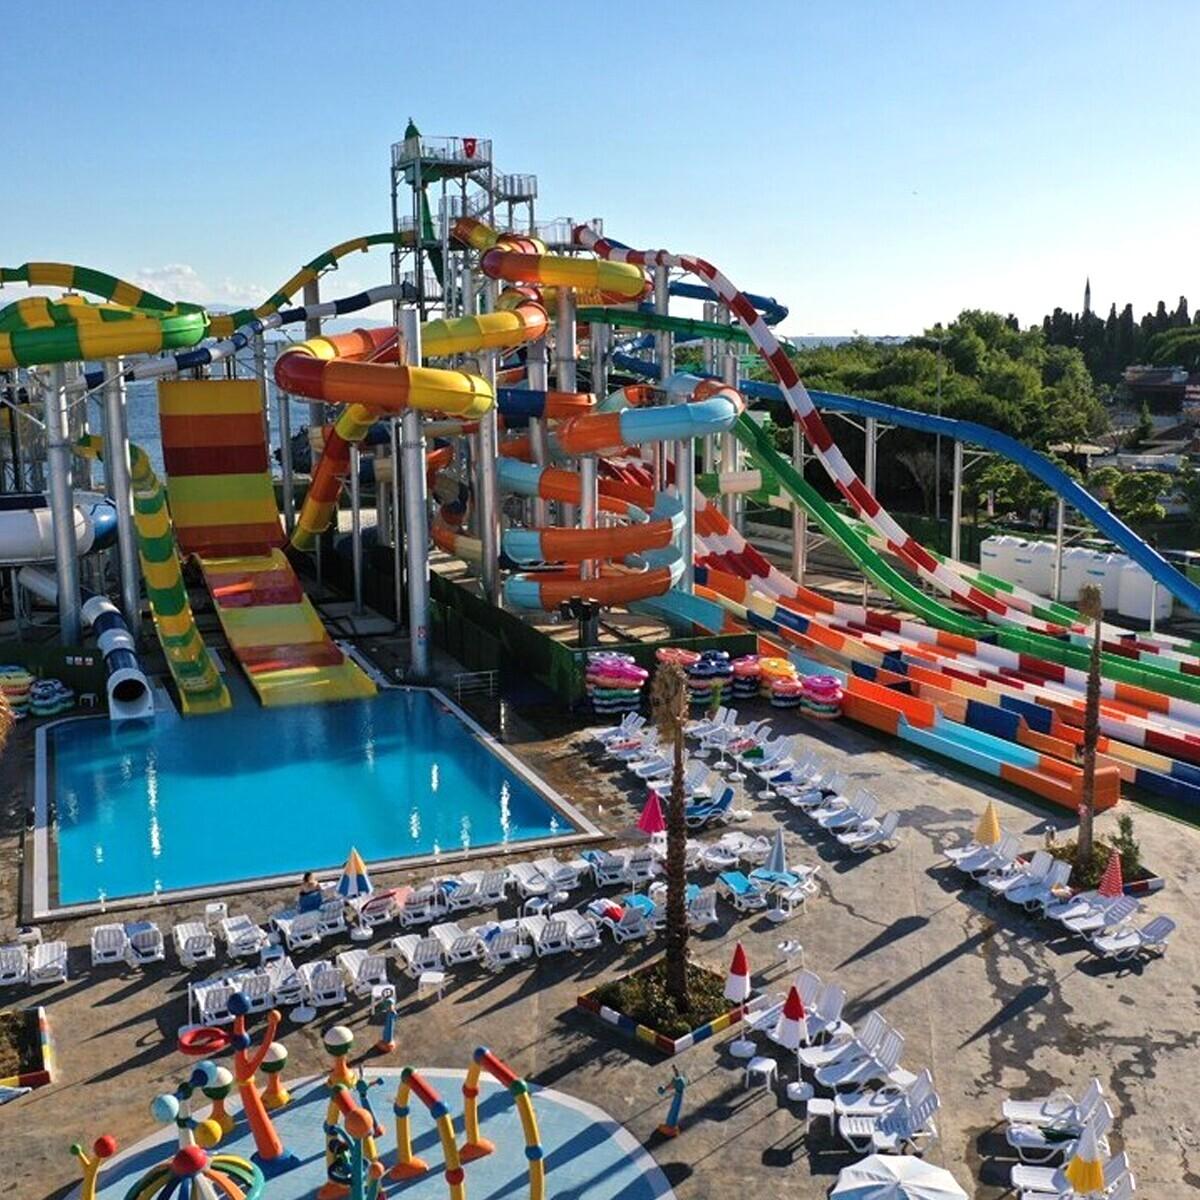 Tuzla Marina Aquapark Giriş Bileti